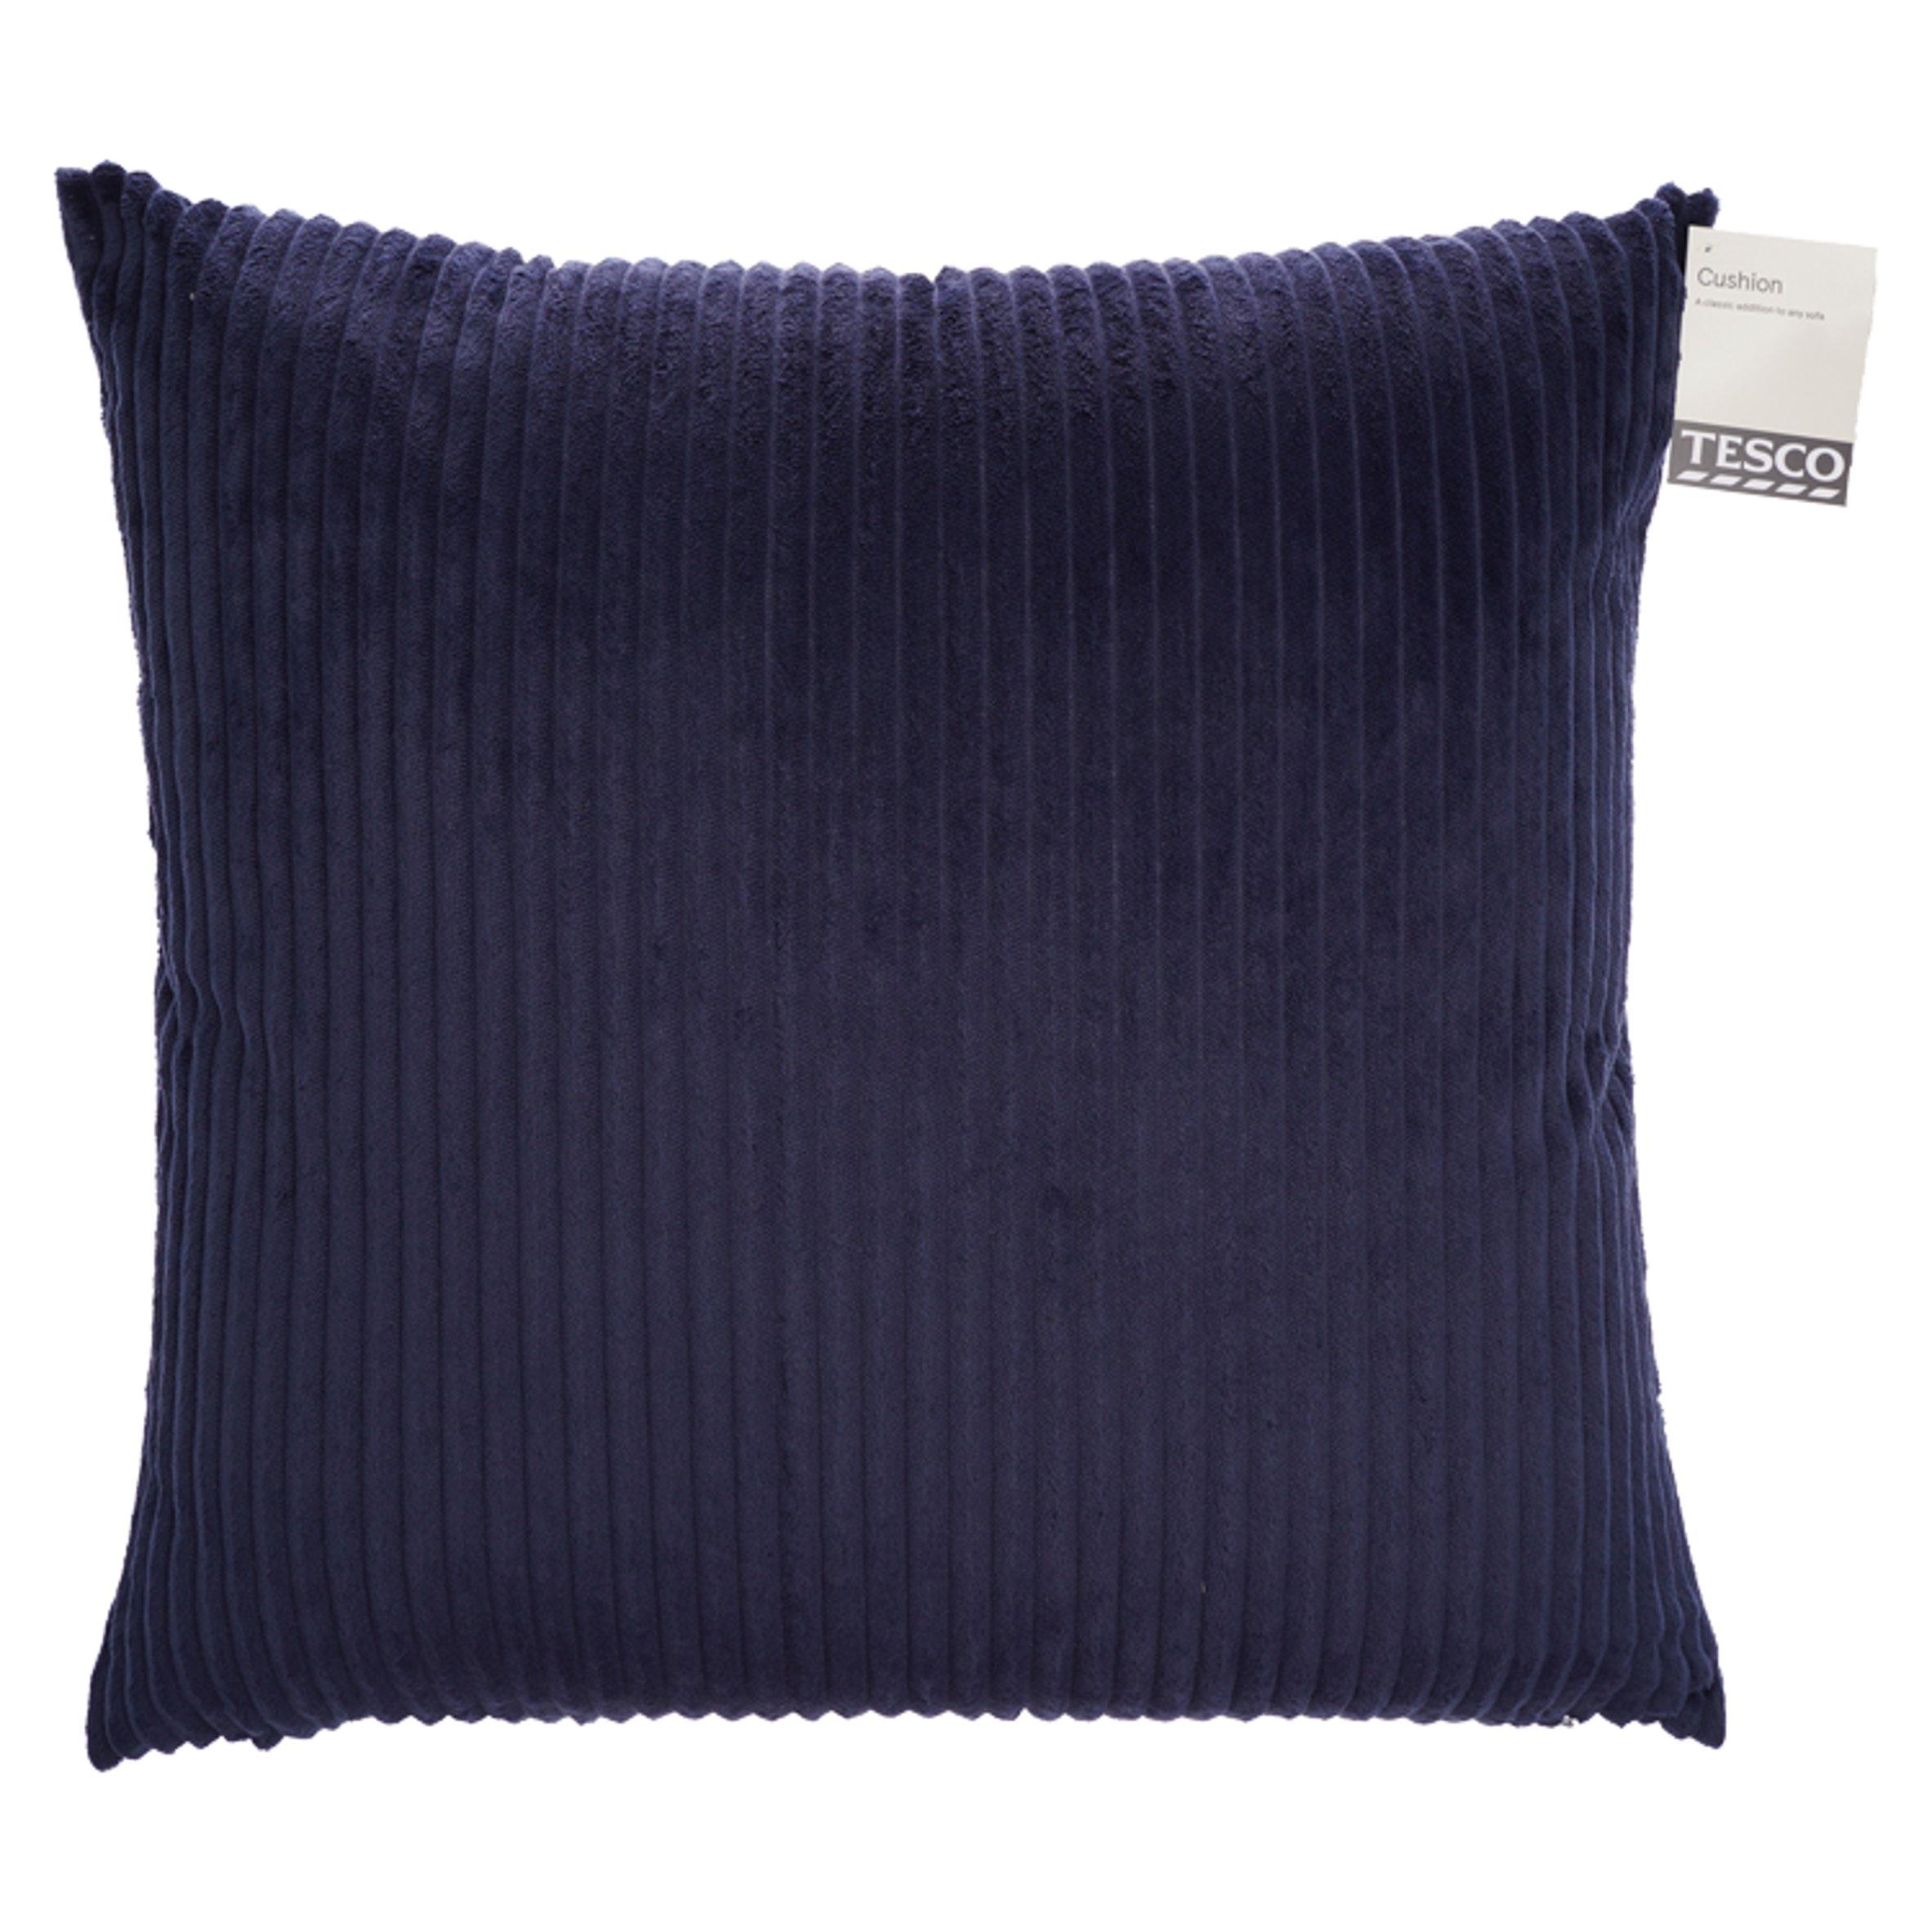 Tesco Jumbo Cord Cushion Navy